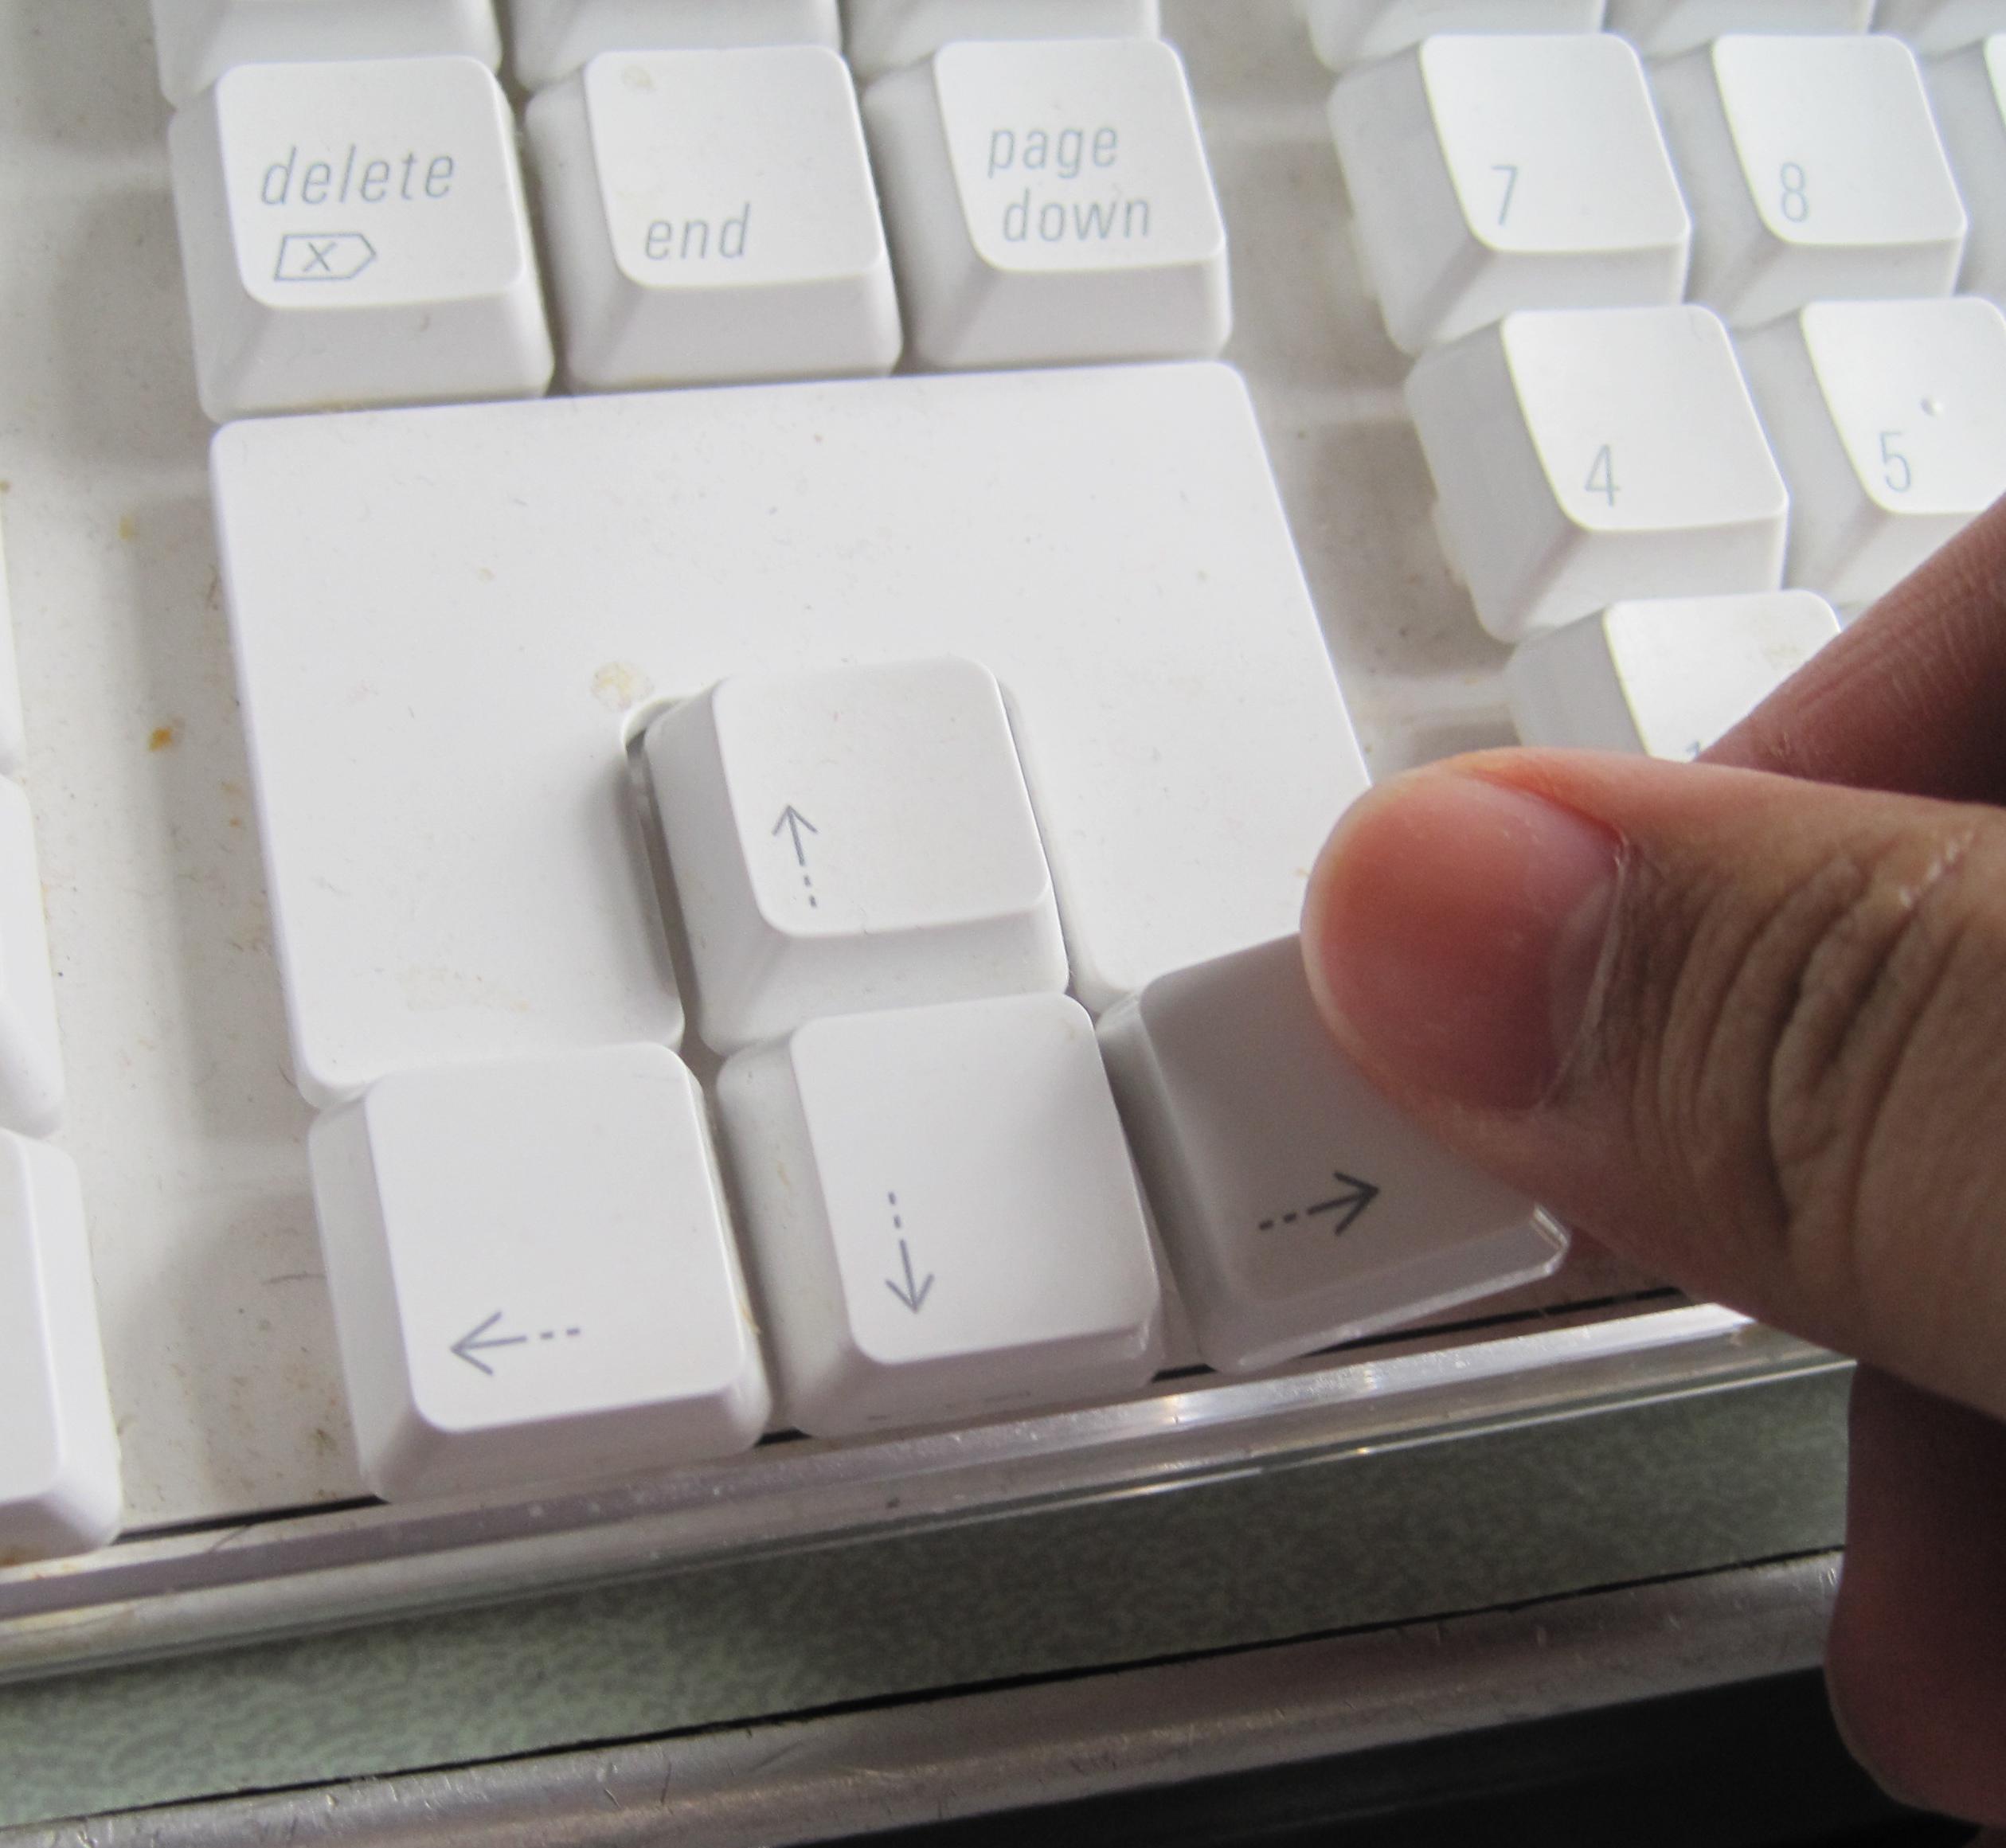 Deep Clean Your Apple Keyboard So it Looks Pristine